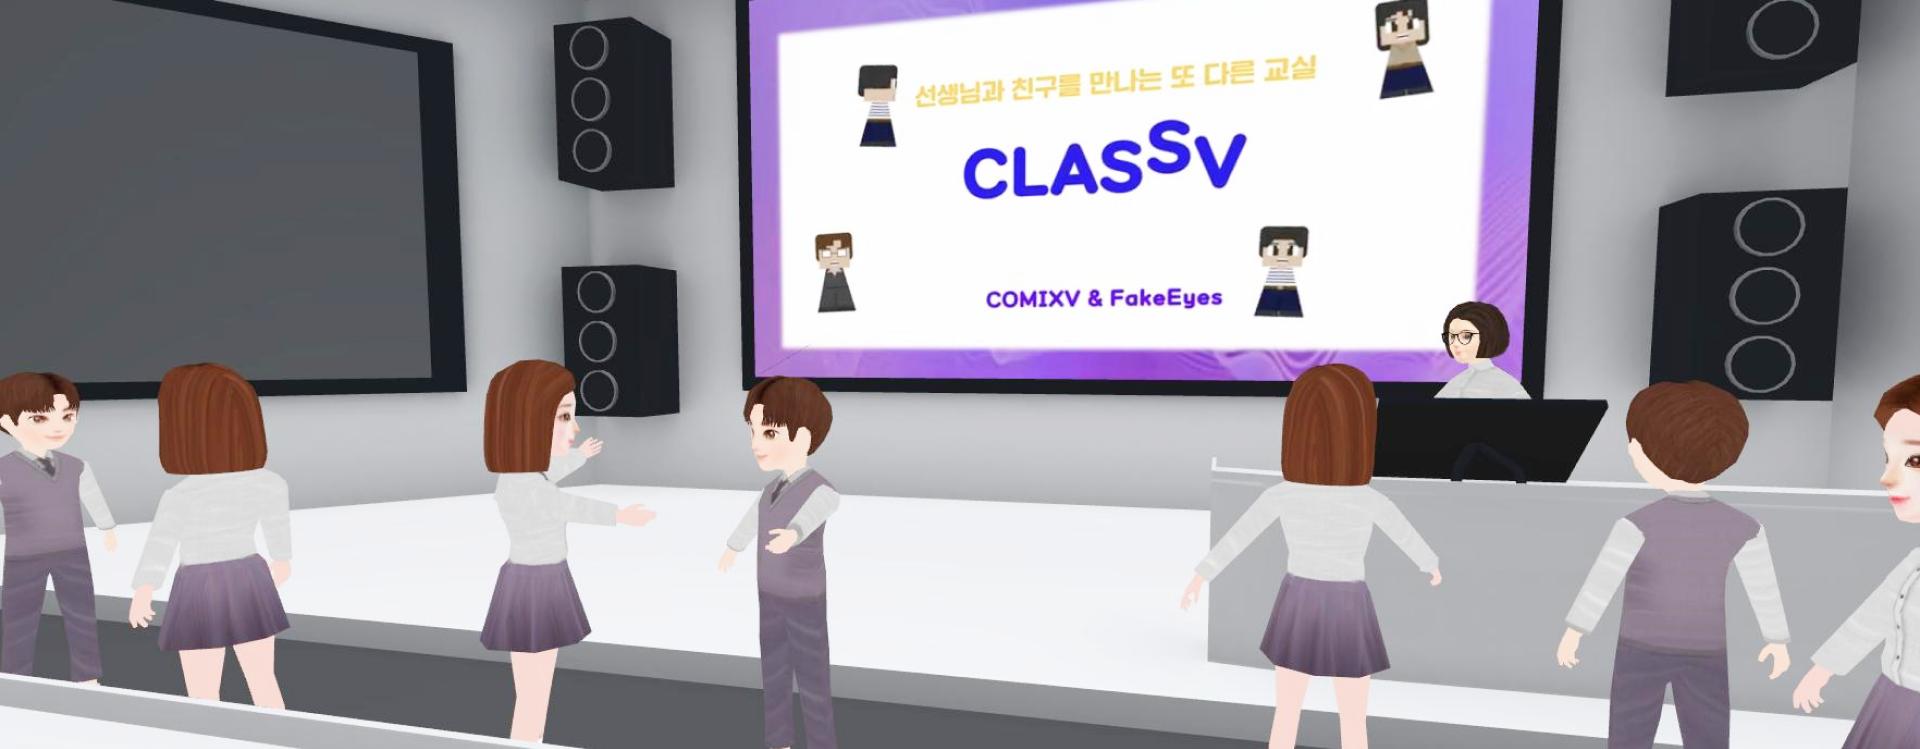 CLASSV Main banner